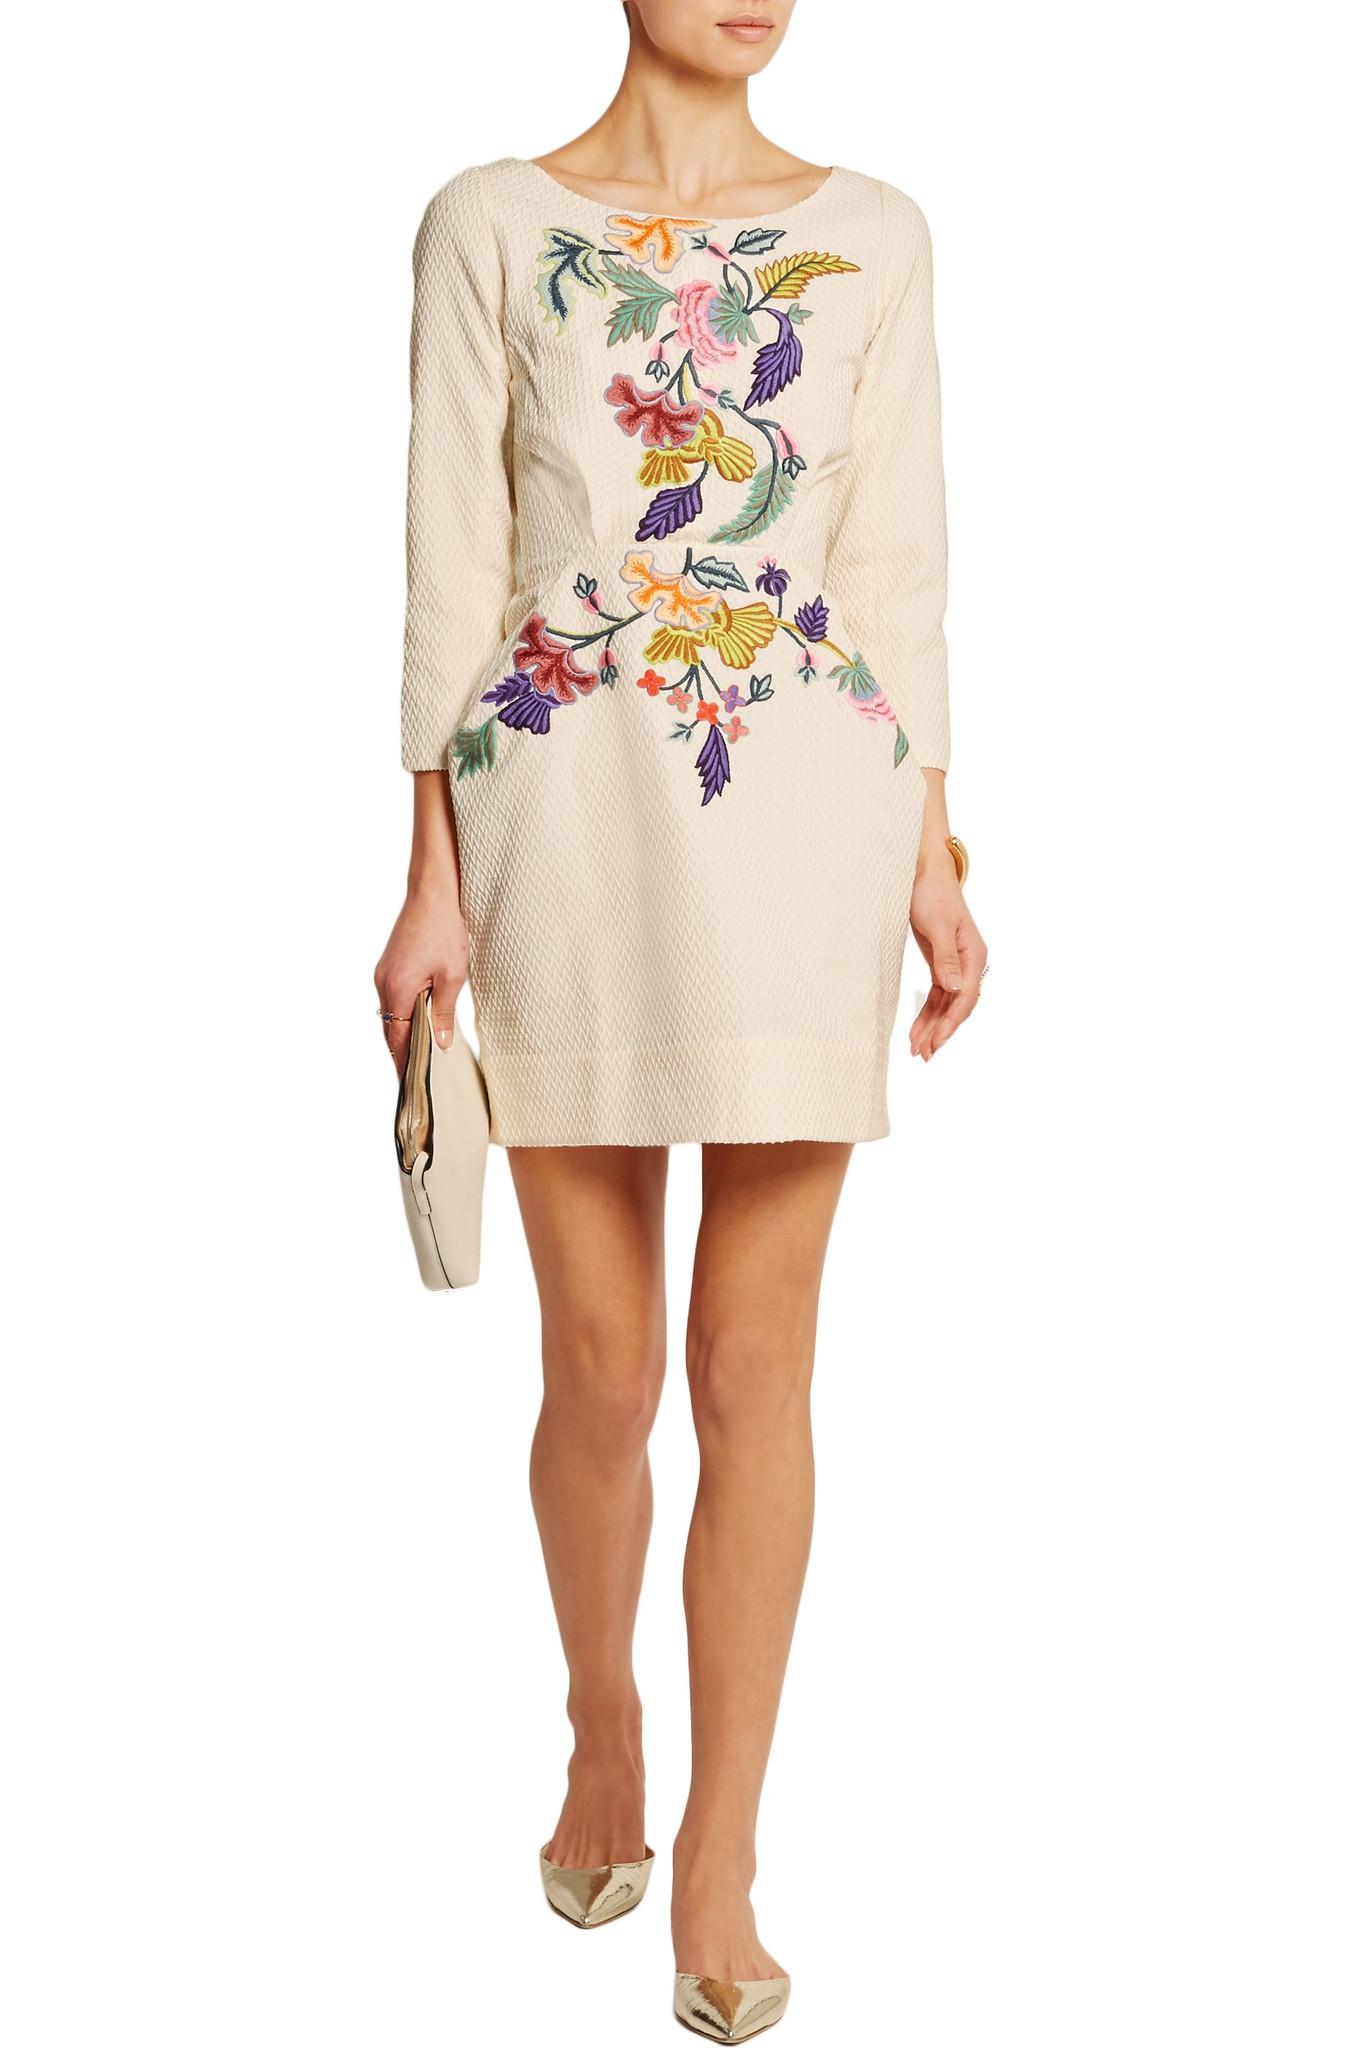 Vineet bahl floral embroidered matelassé mini dress in